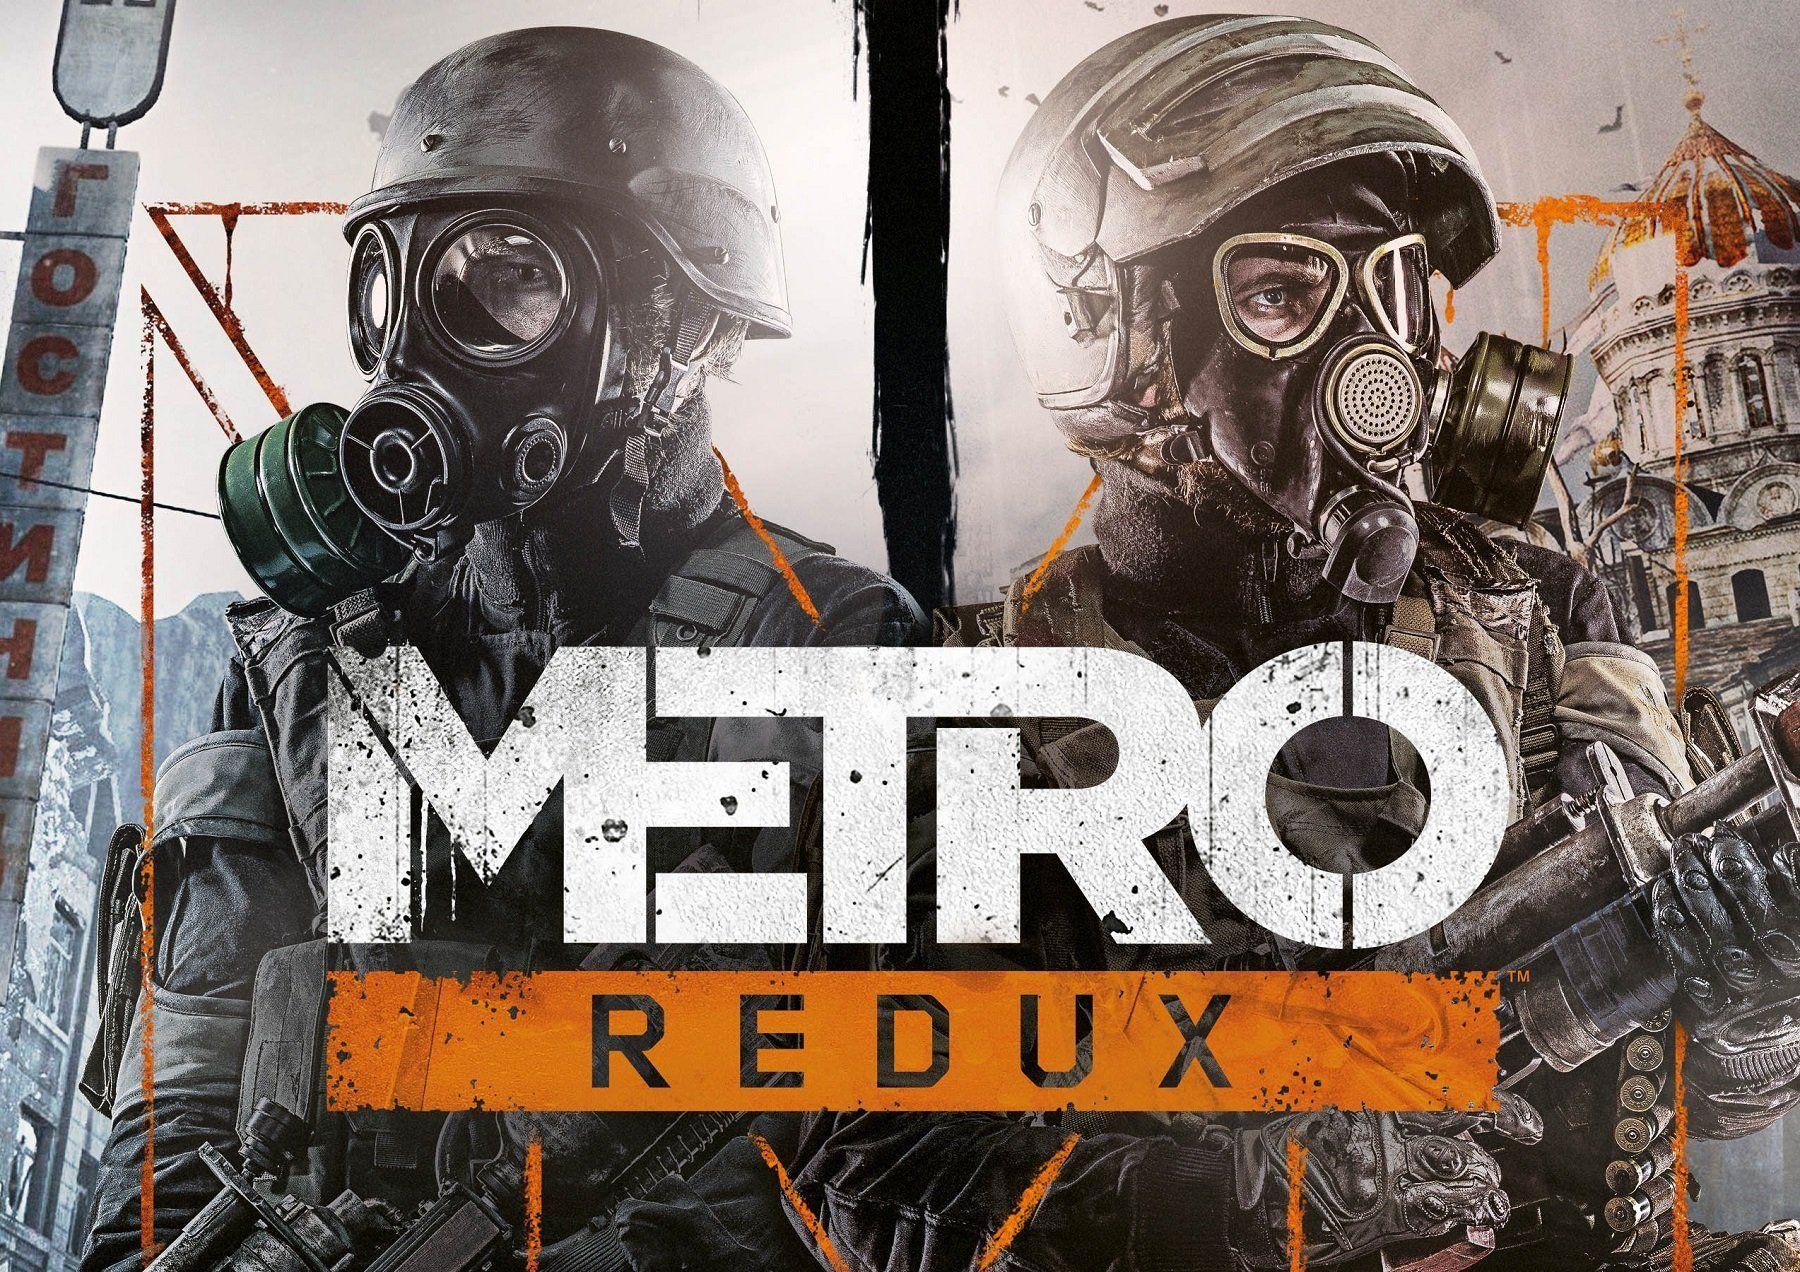 Metro Redux Poster Pc games wallpapers, Metro last light